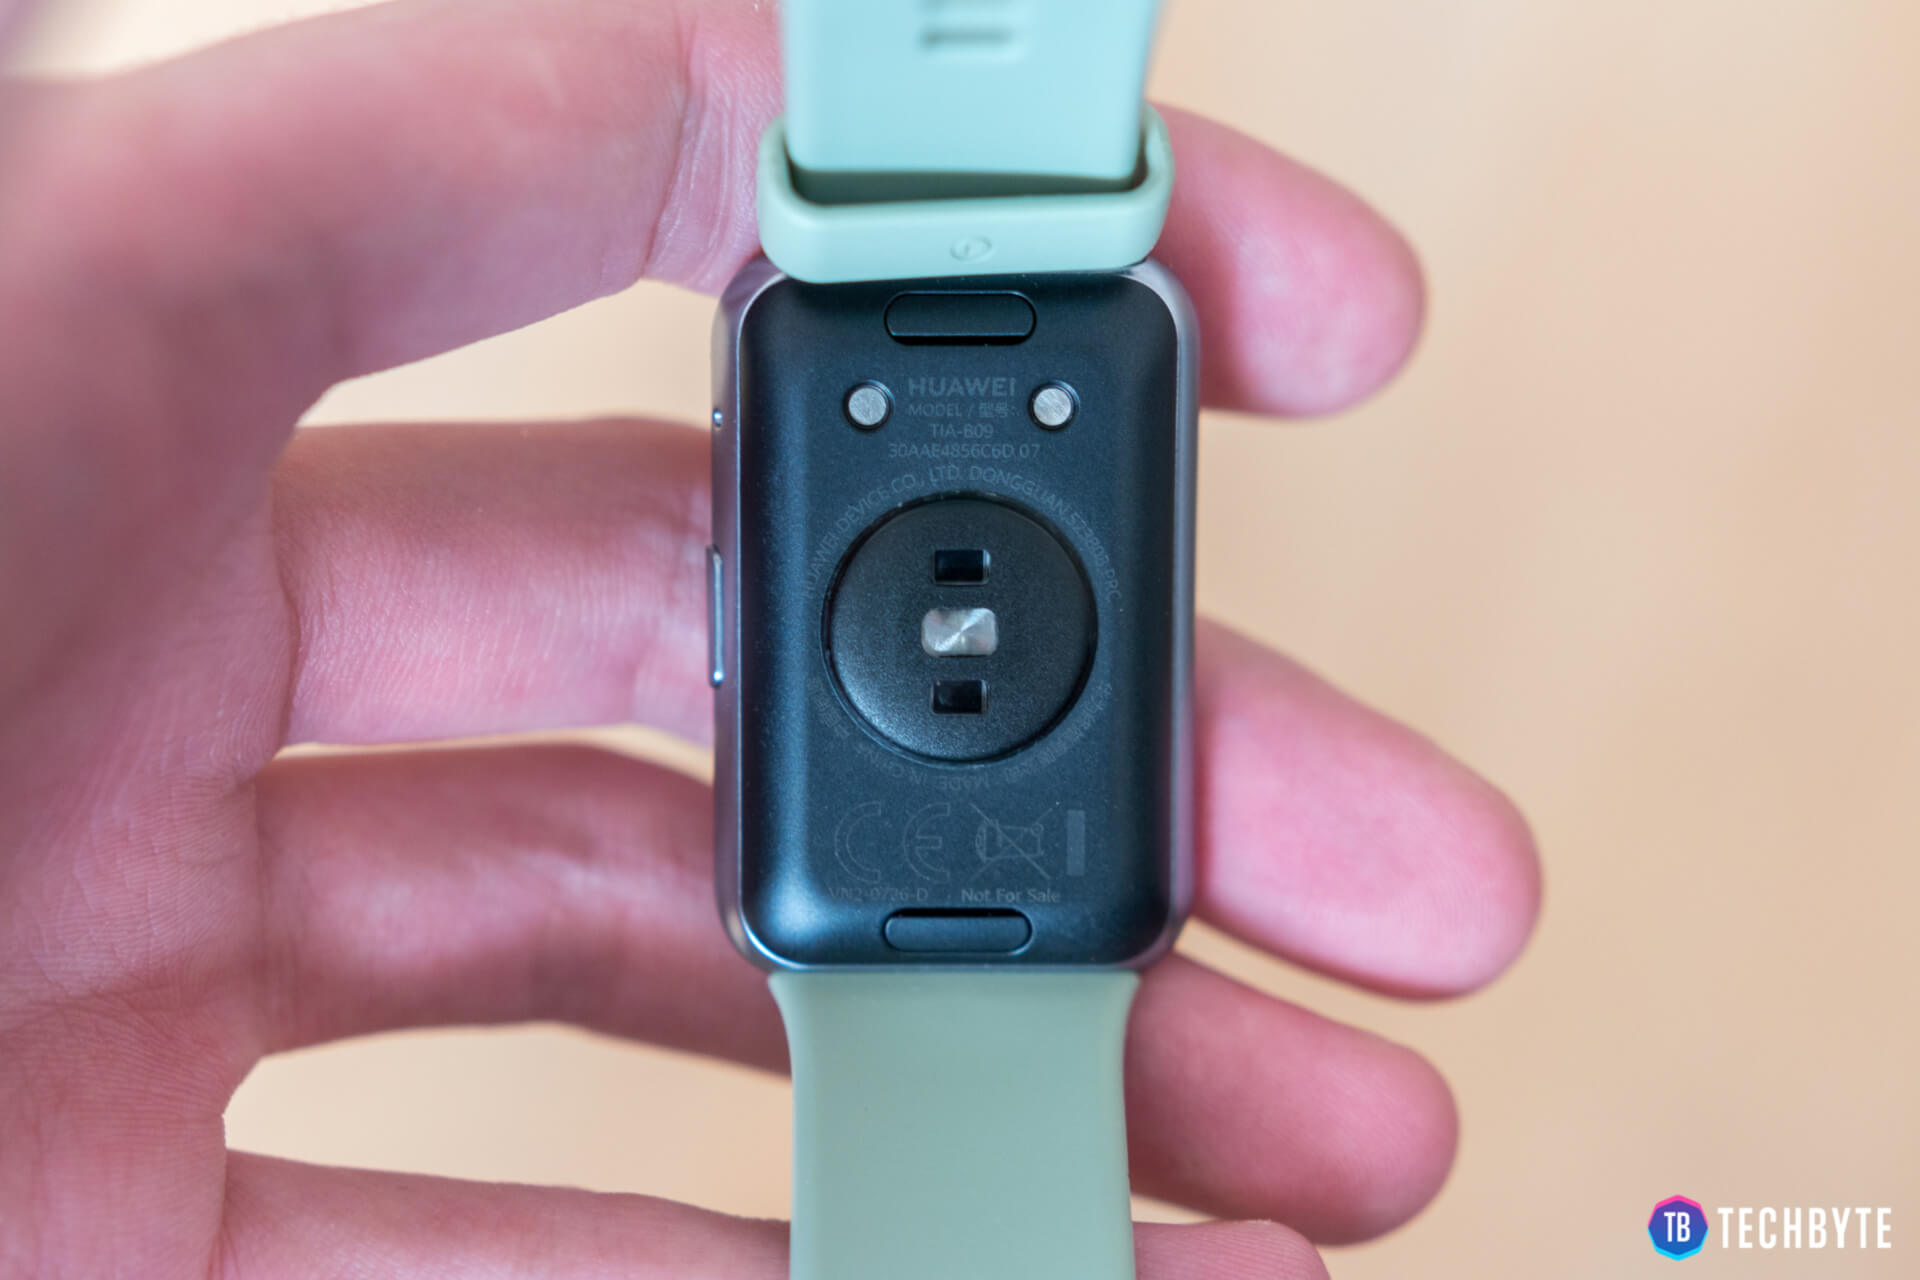 Huawei watch fit 10 1